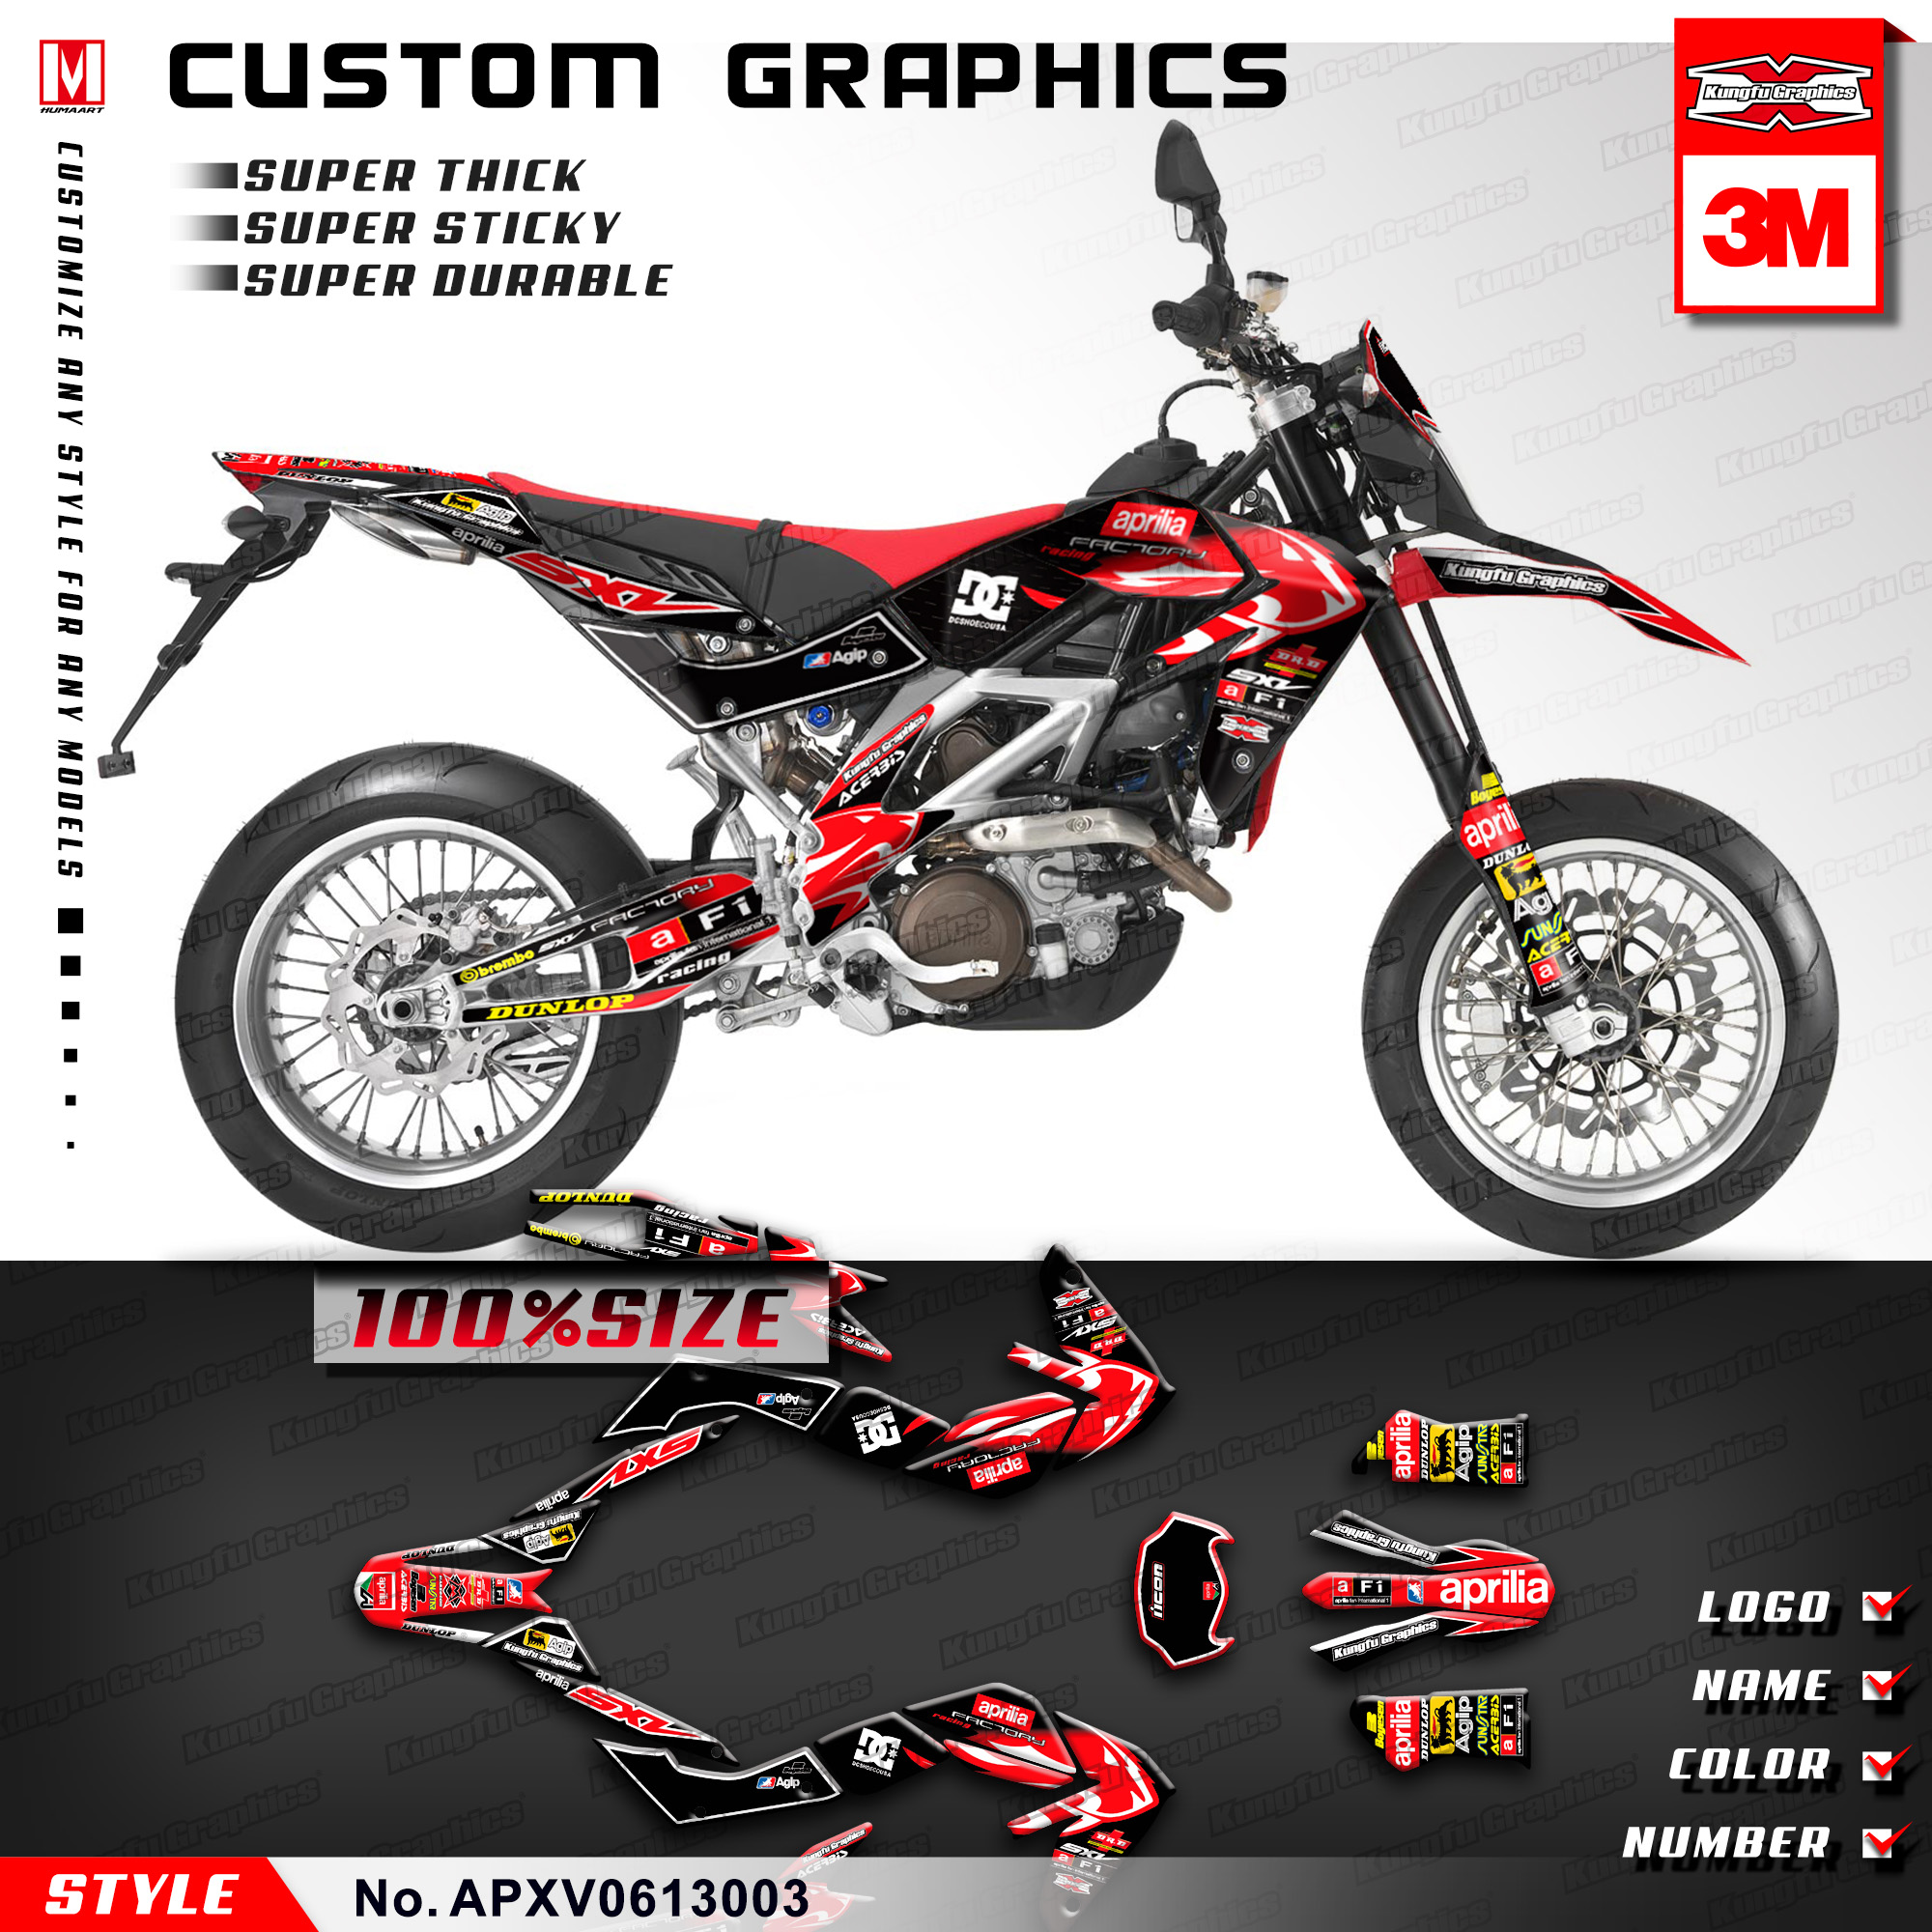 Awesome Kungfu Graphics Custom Mx Decals Kit Fit Aprilia Sxv Rxv 450 550 Wiring Digital Resources Caliashwinbiharinl